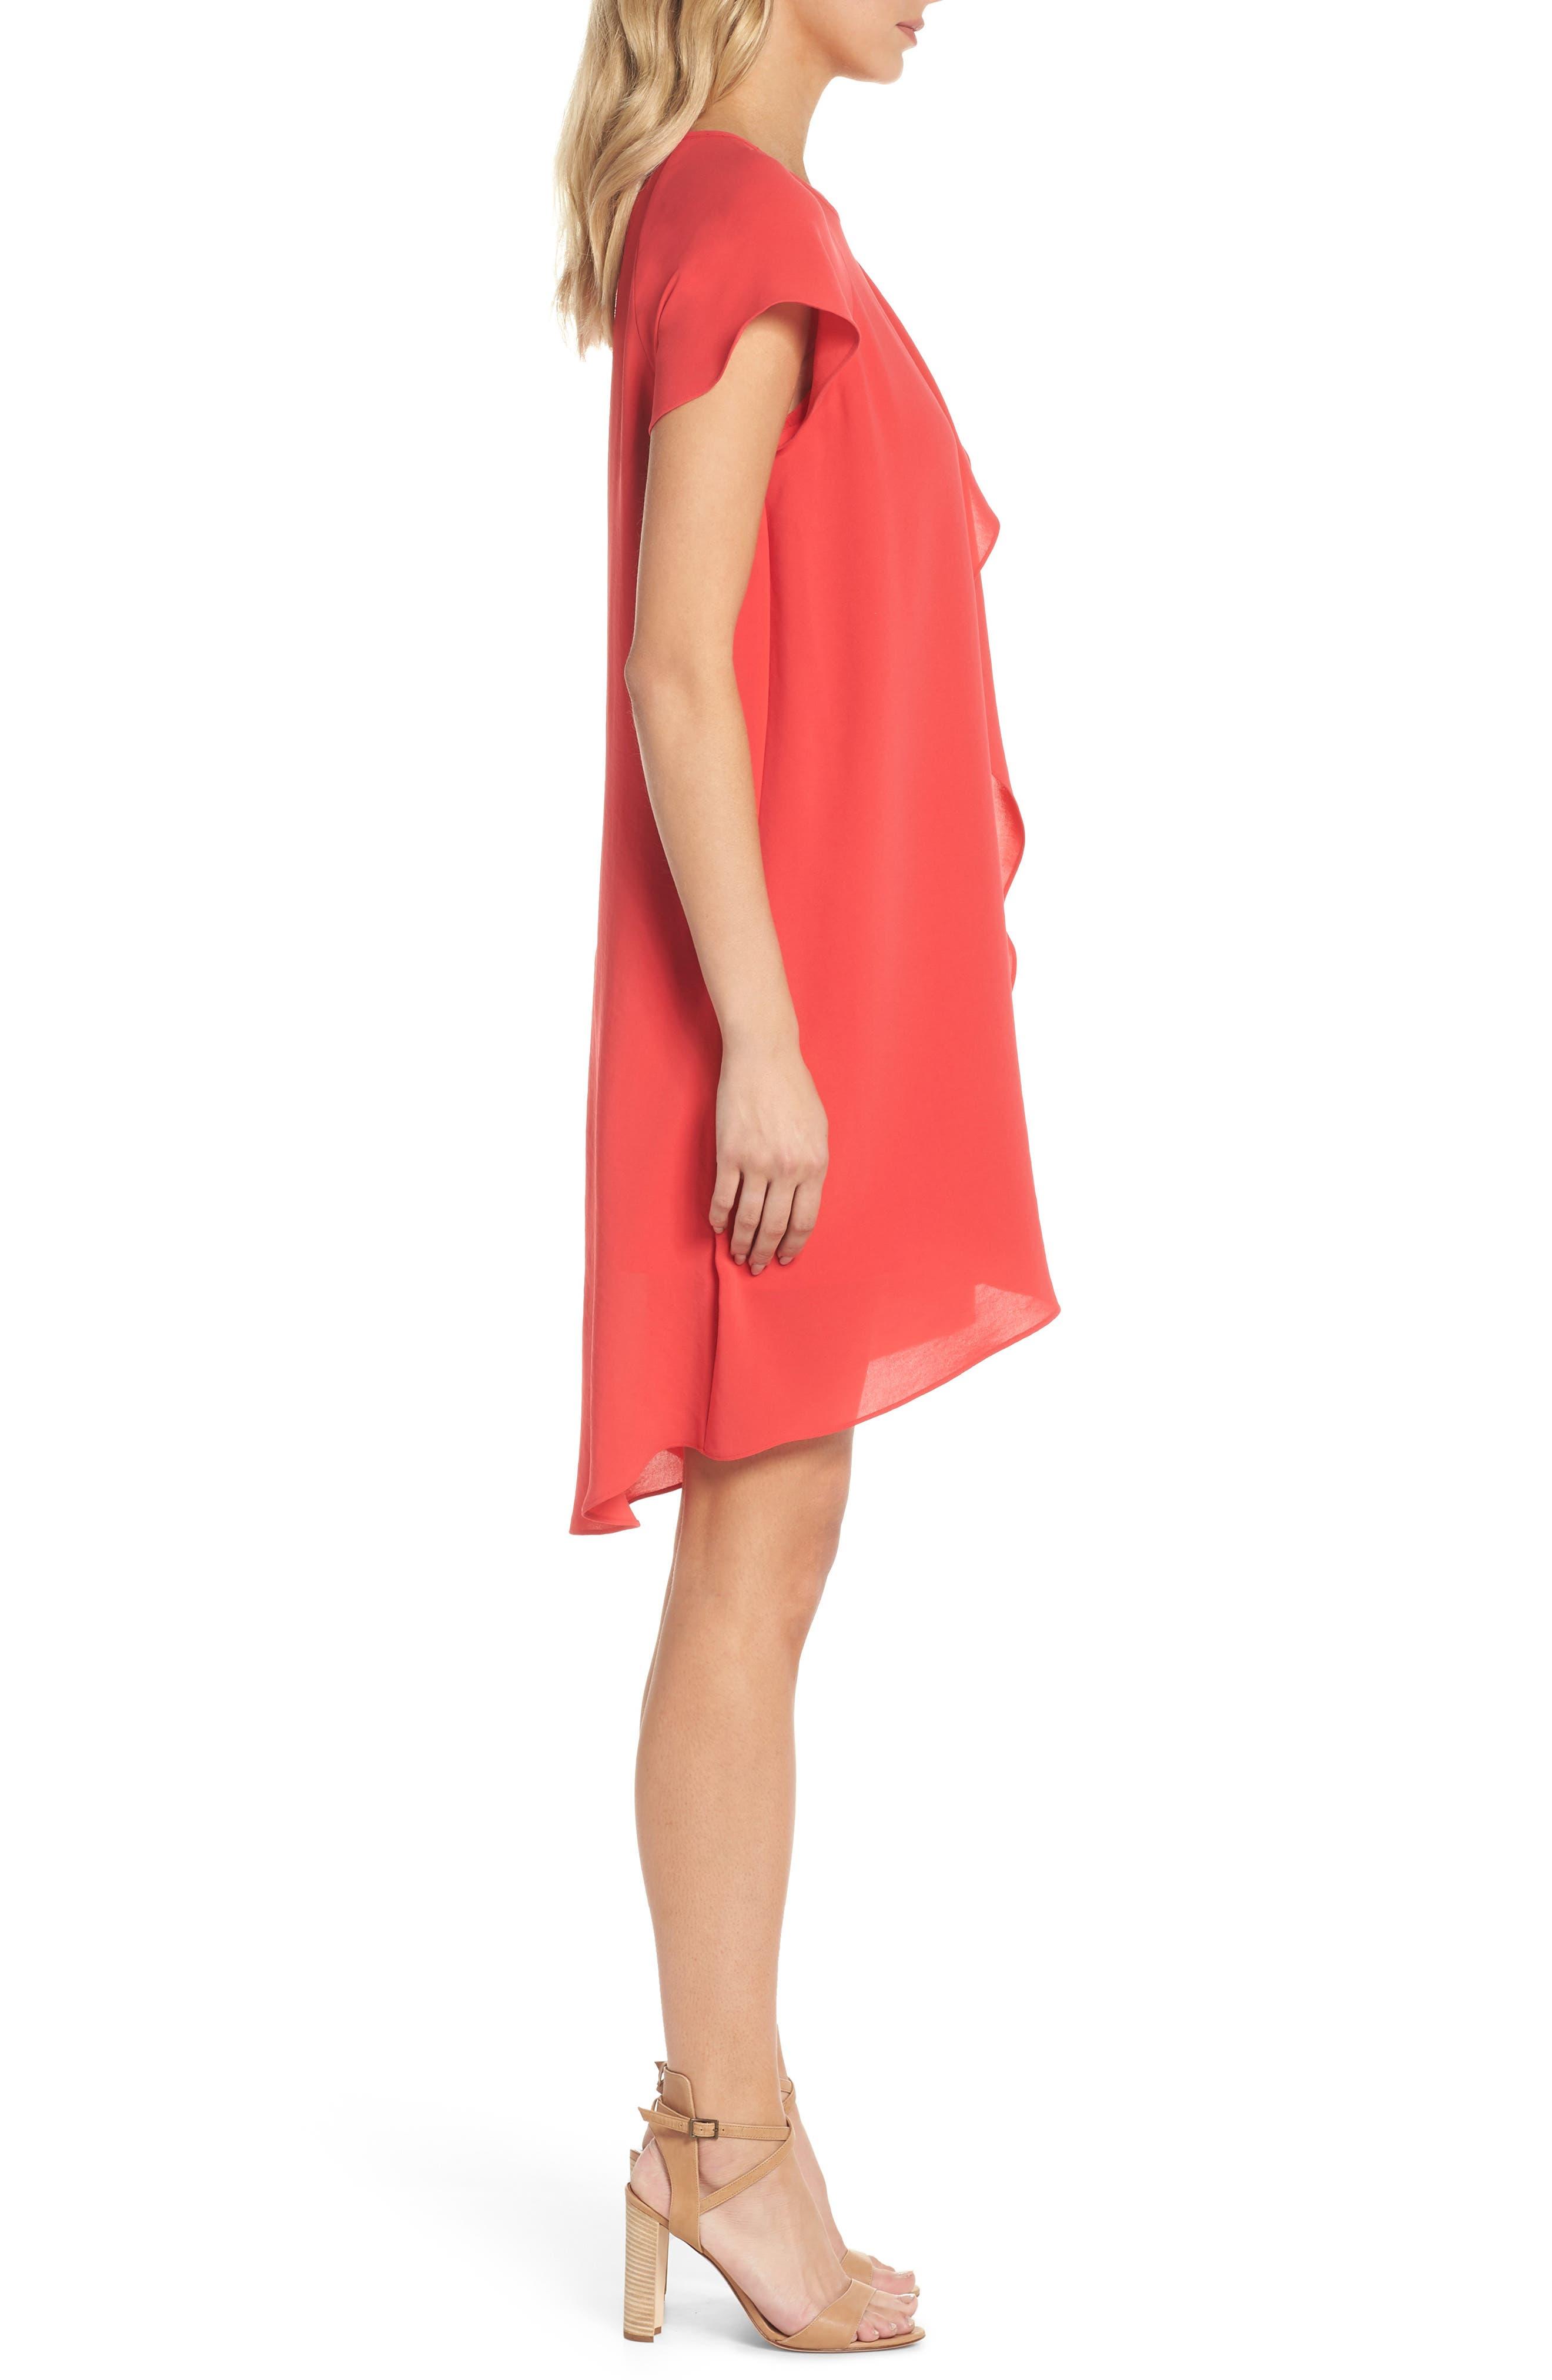 ADRIANNA PAPELL, Crepe Shift Dress, Alternate thumbnail 4, color, 650